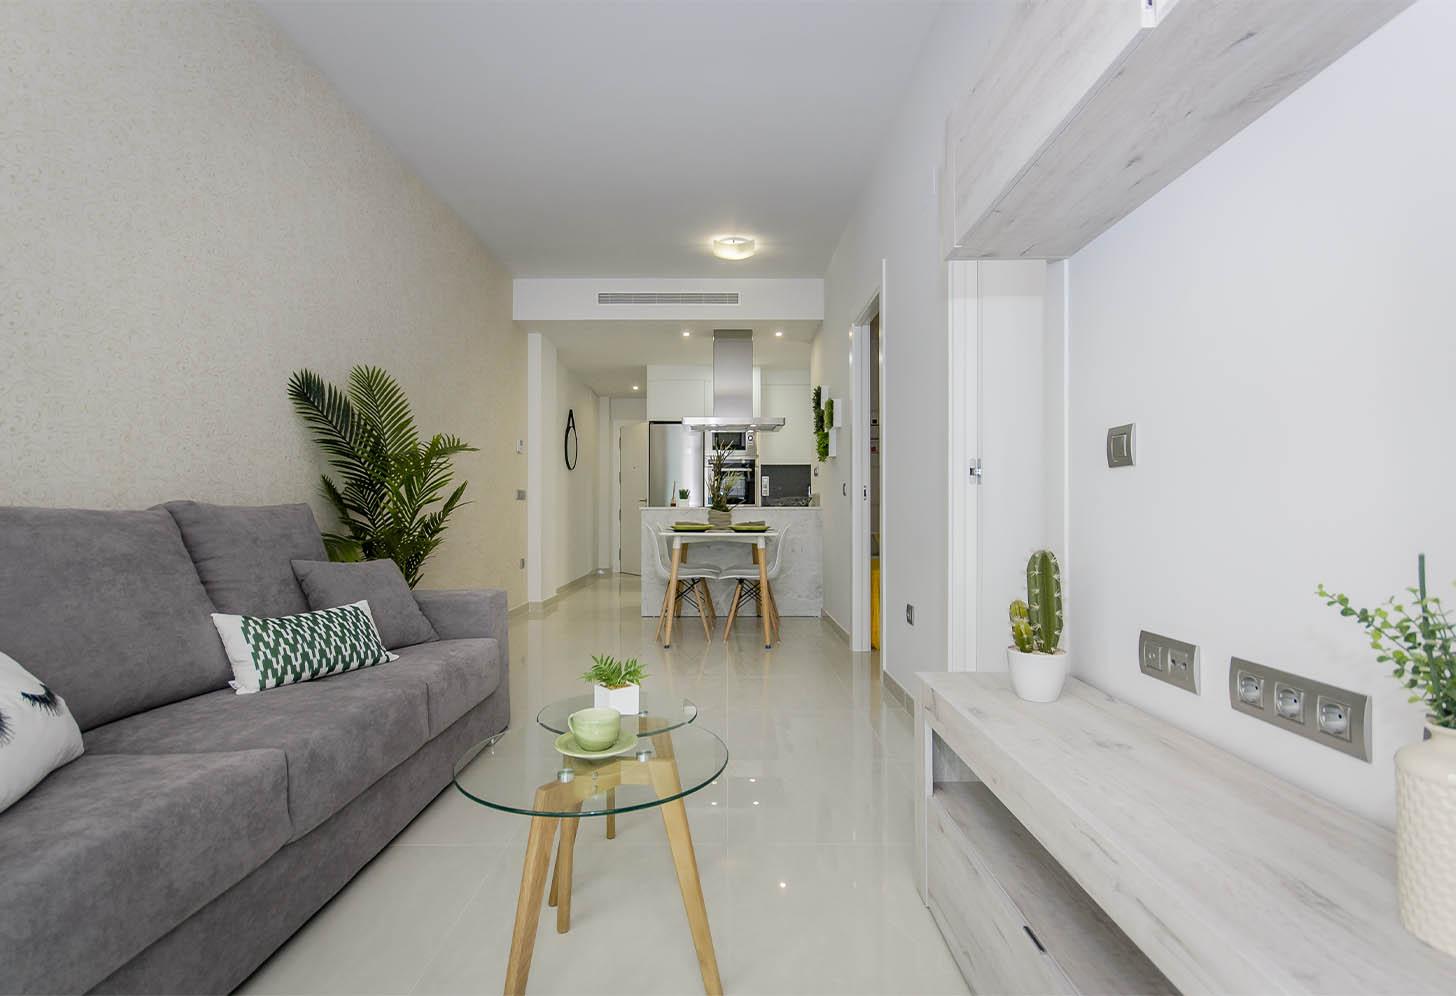 immobilier neuf espagne costa blanca on-p2 cibeles salon